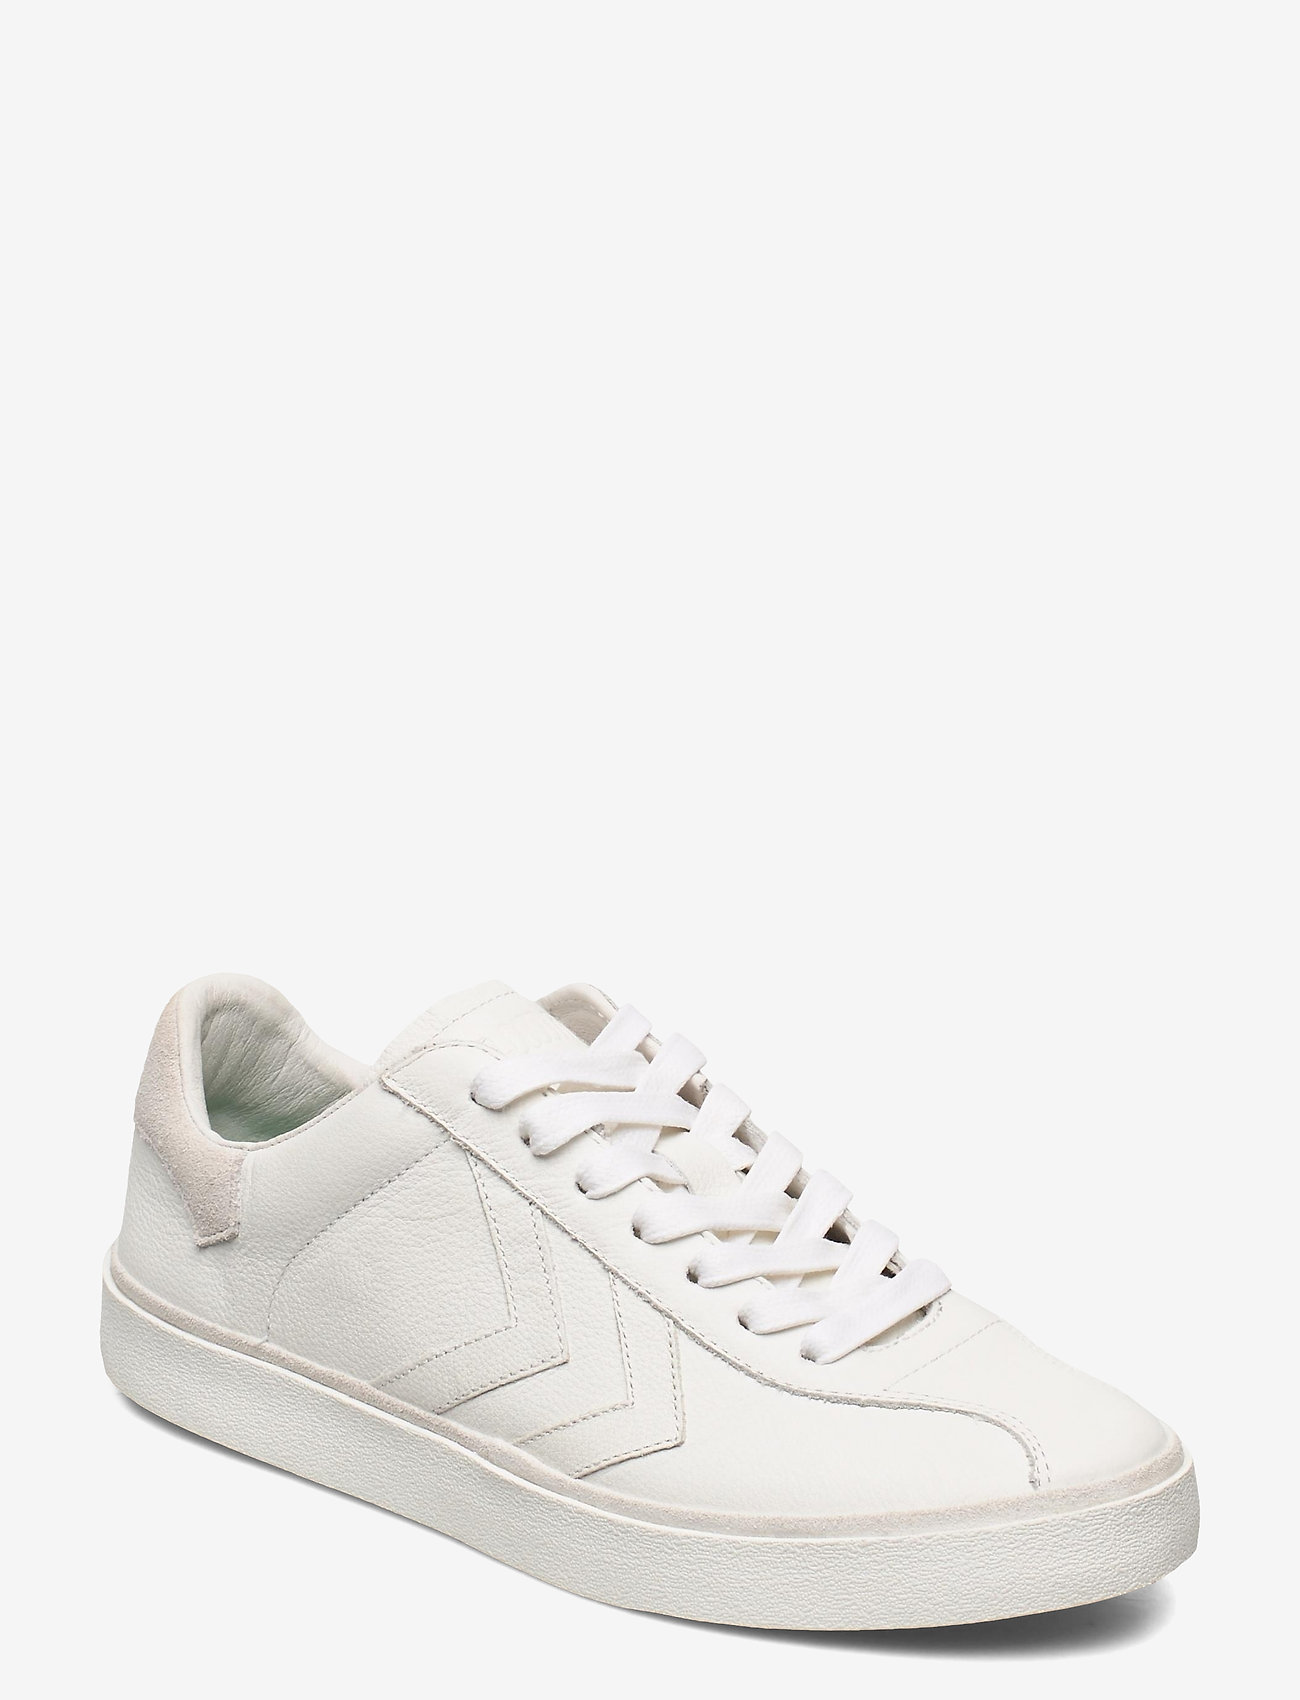 Hummel - DIAMANT - laag sneakers - white - 0